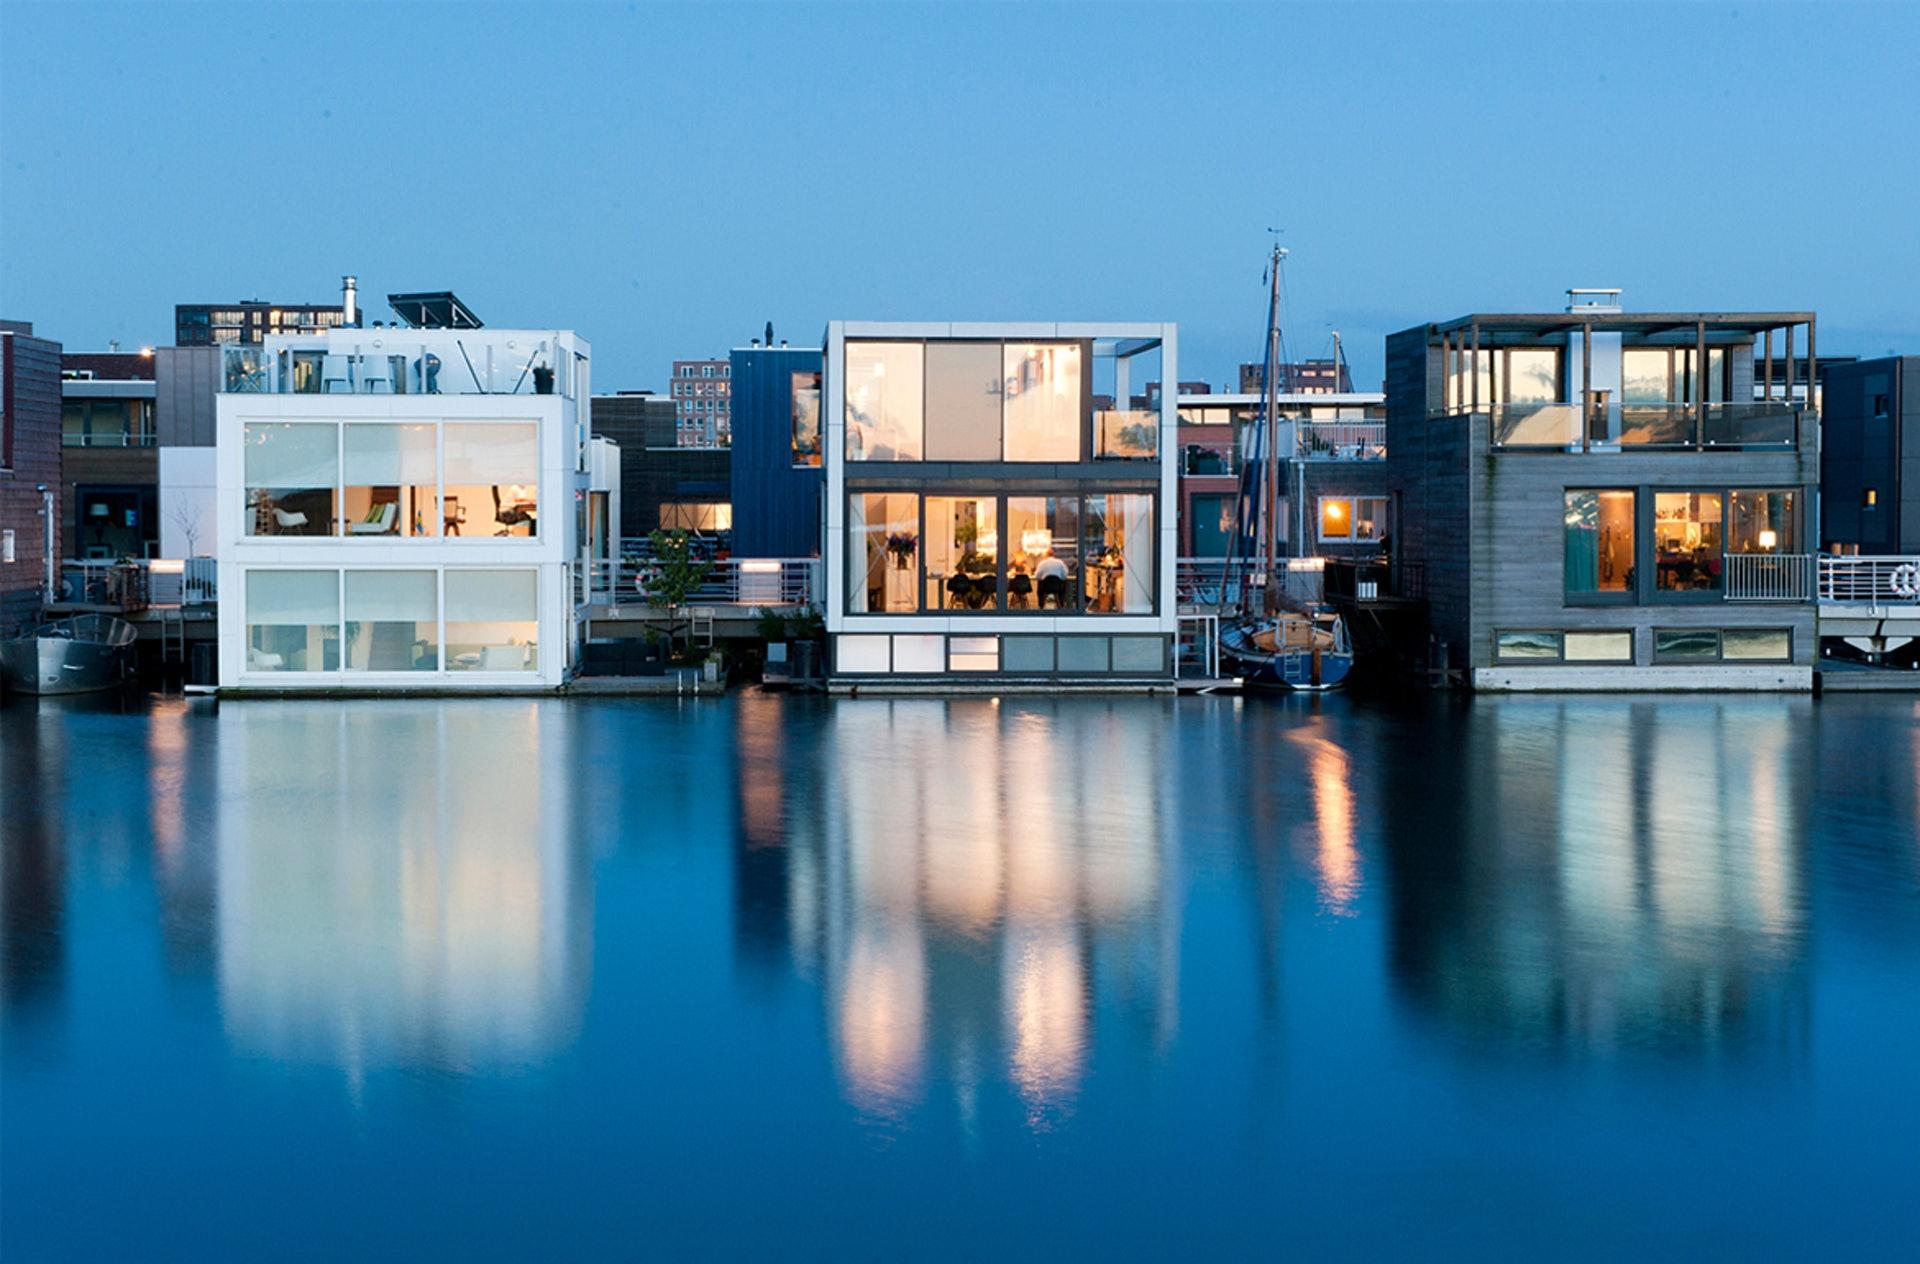 Ijburg漂浮屋(Water Studio)